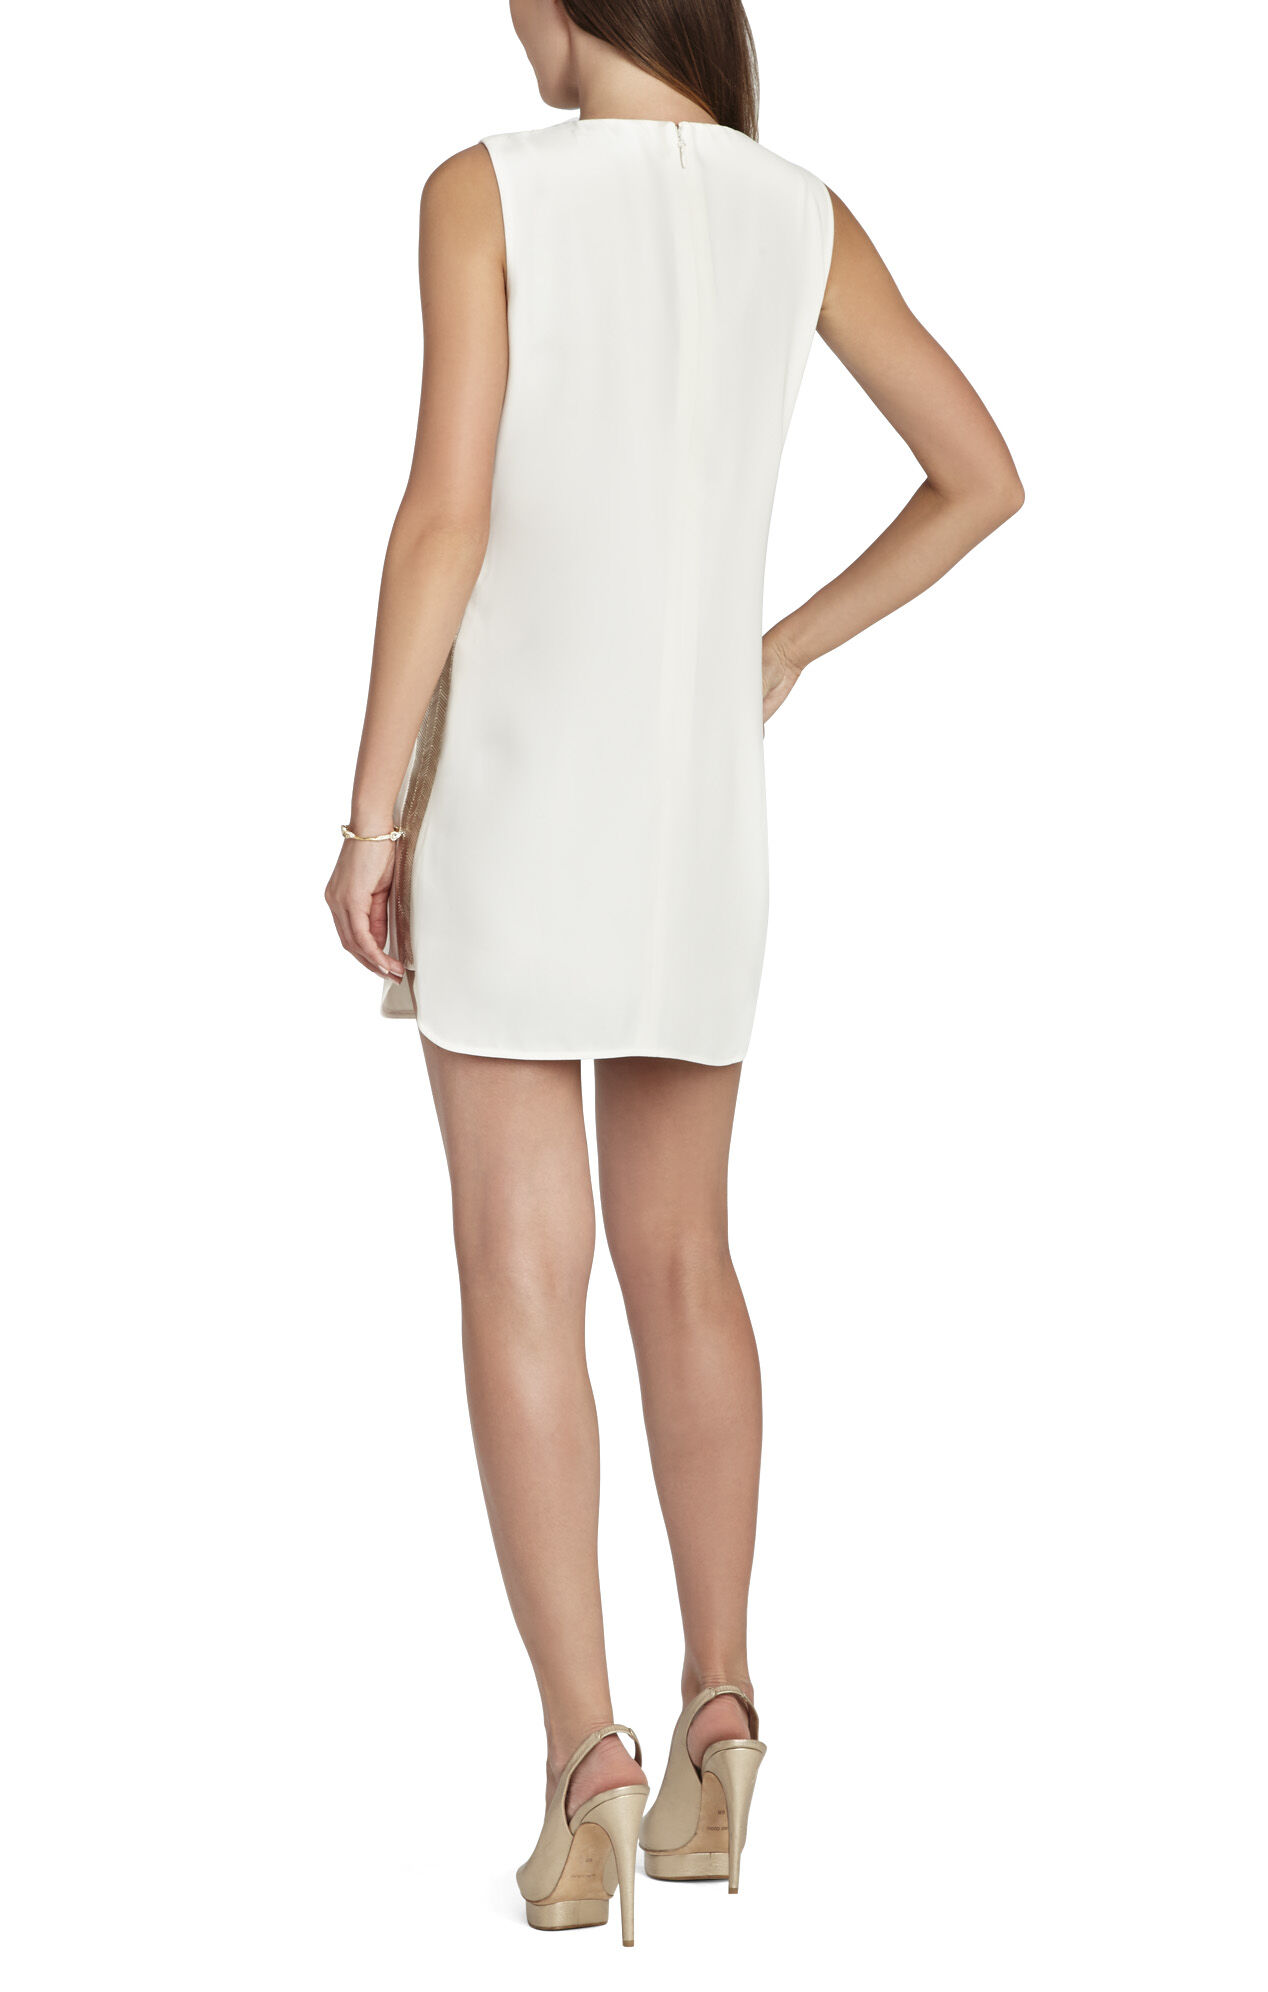 Onyx Beaded Side-Panel Dress